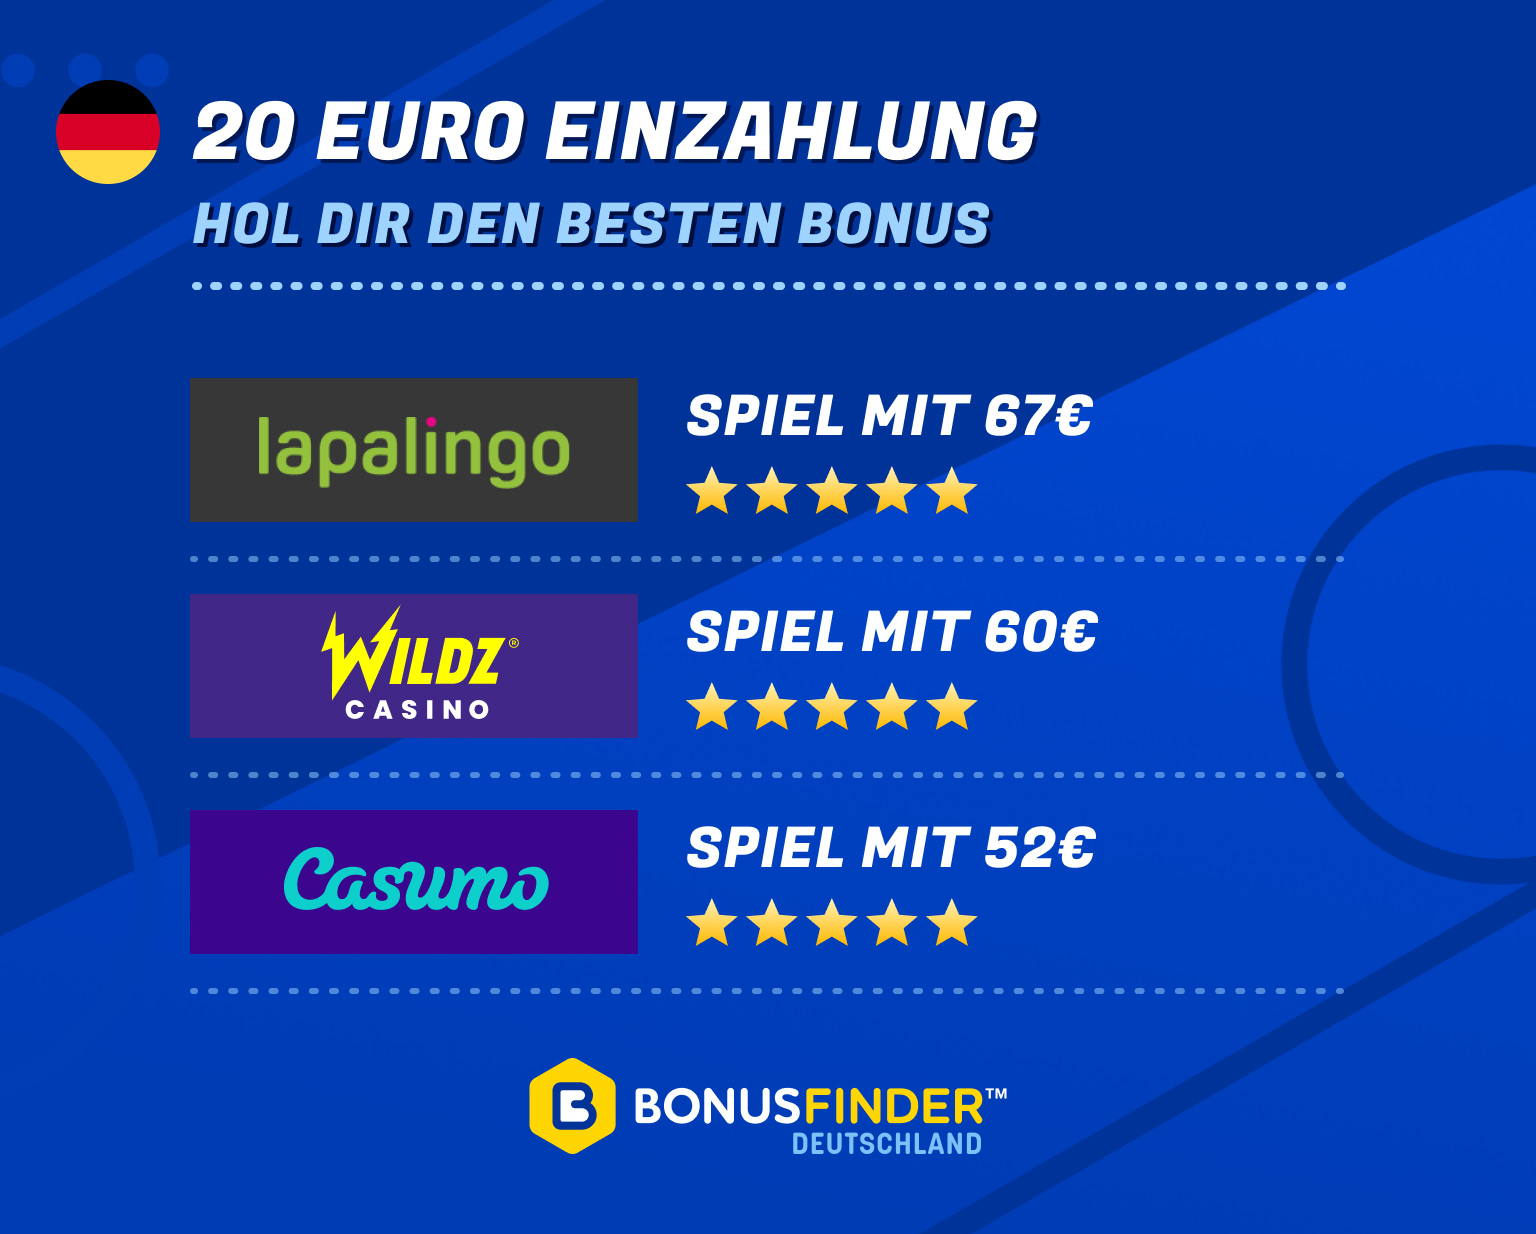 20-euro-einzahlung-casino